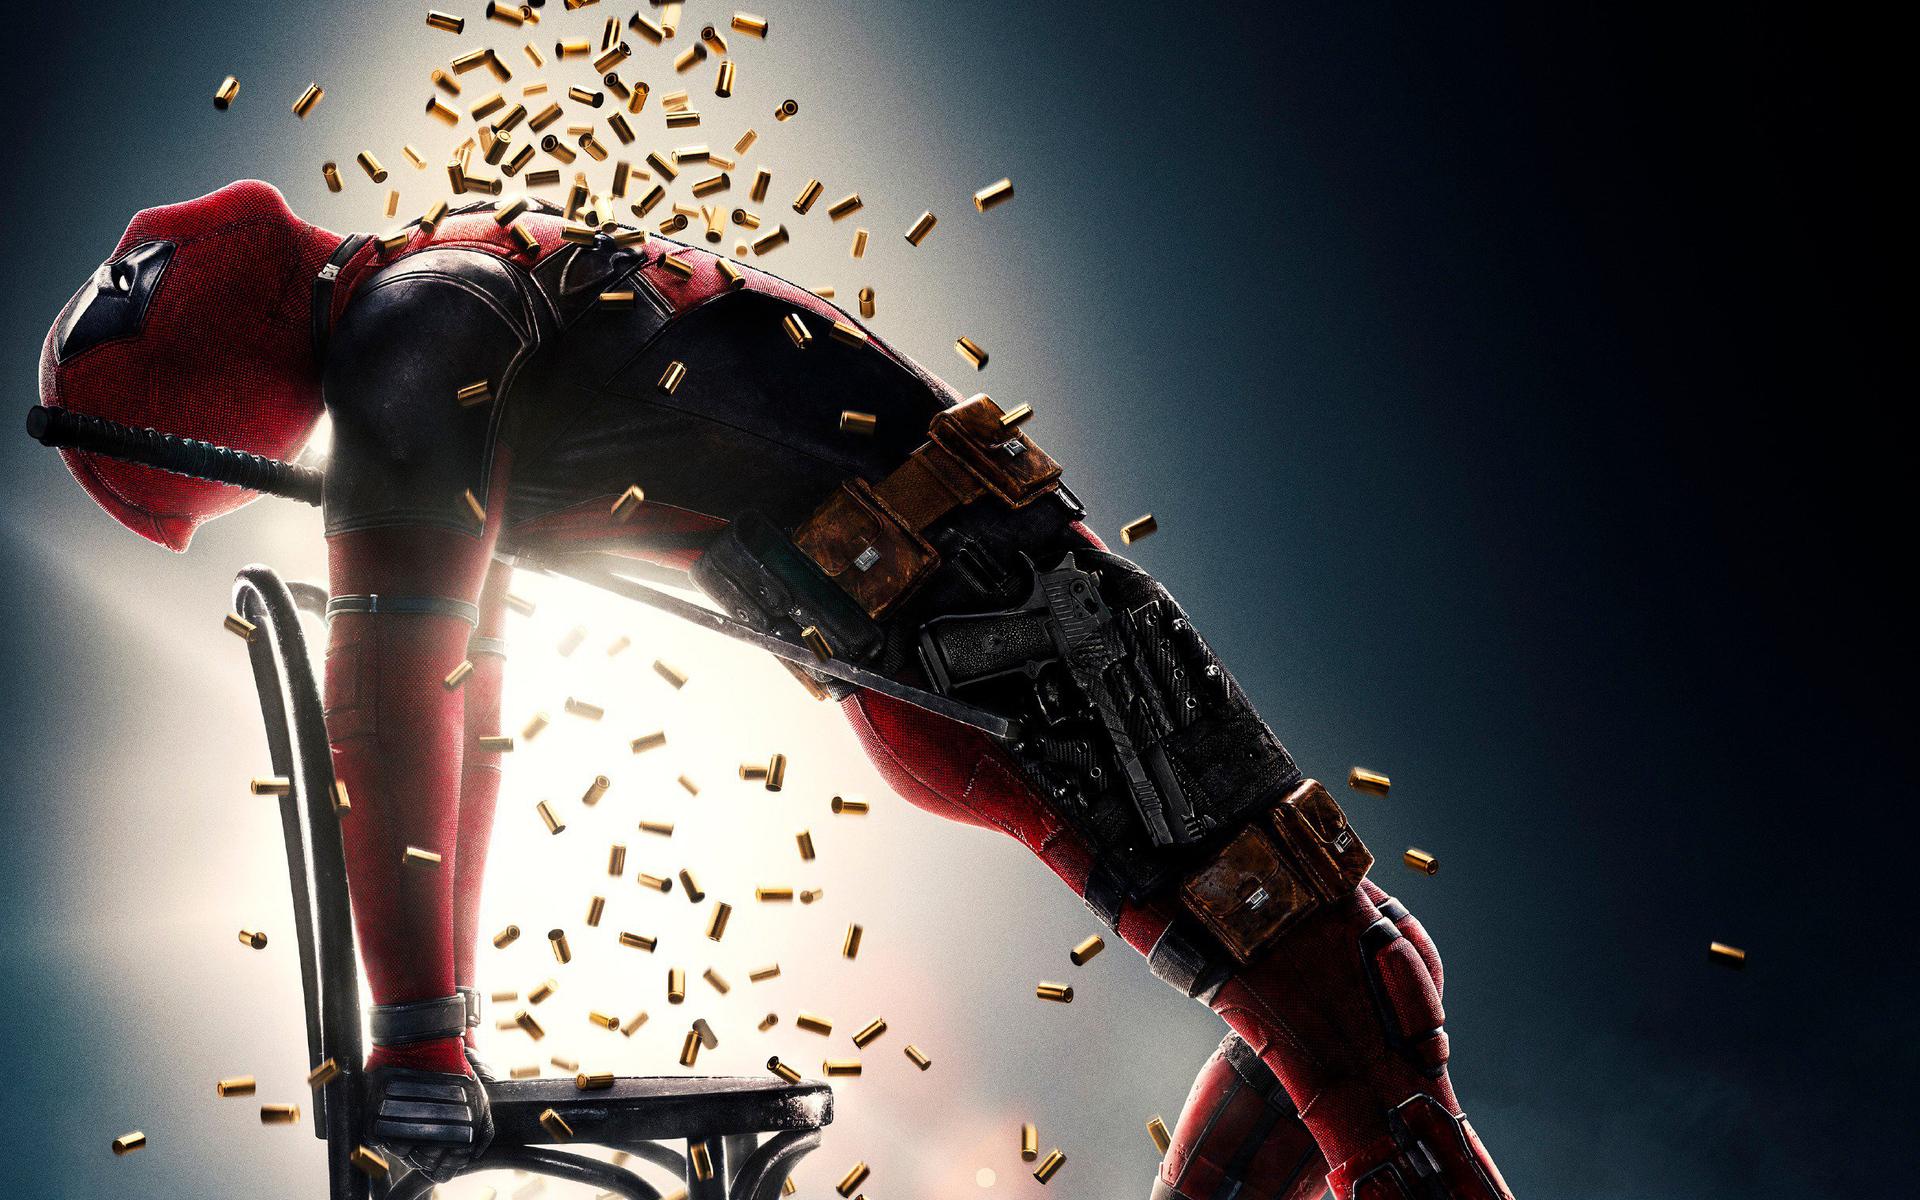 1920x1200 deadpool 2 poster 2018 movie 1080p resolution hd - Deadpool download 1080p ...